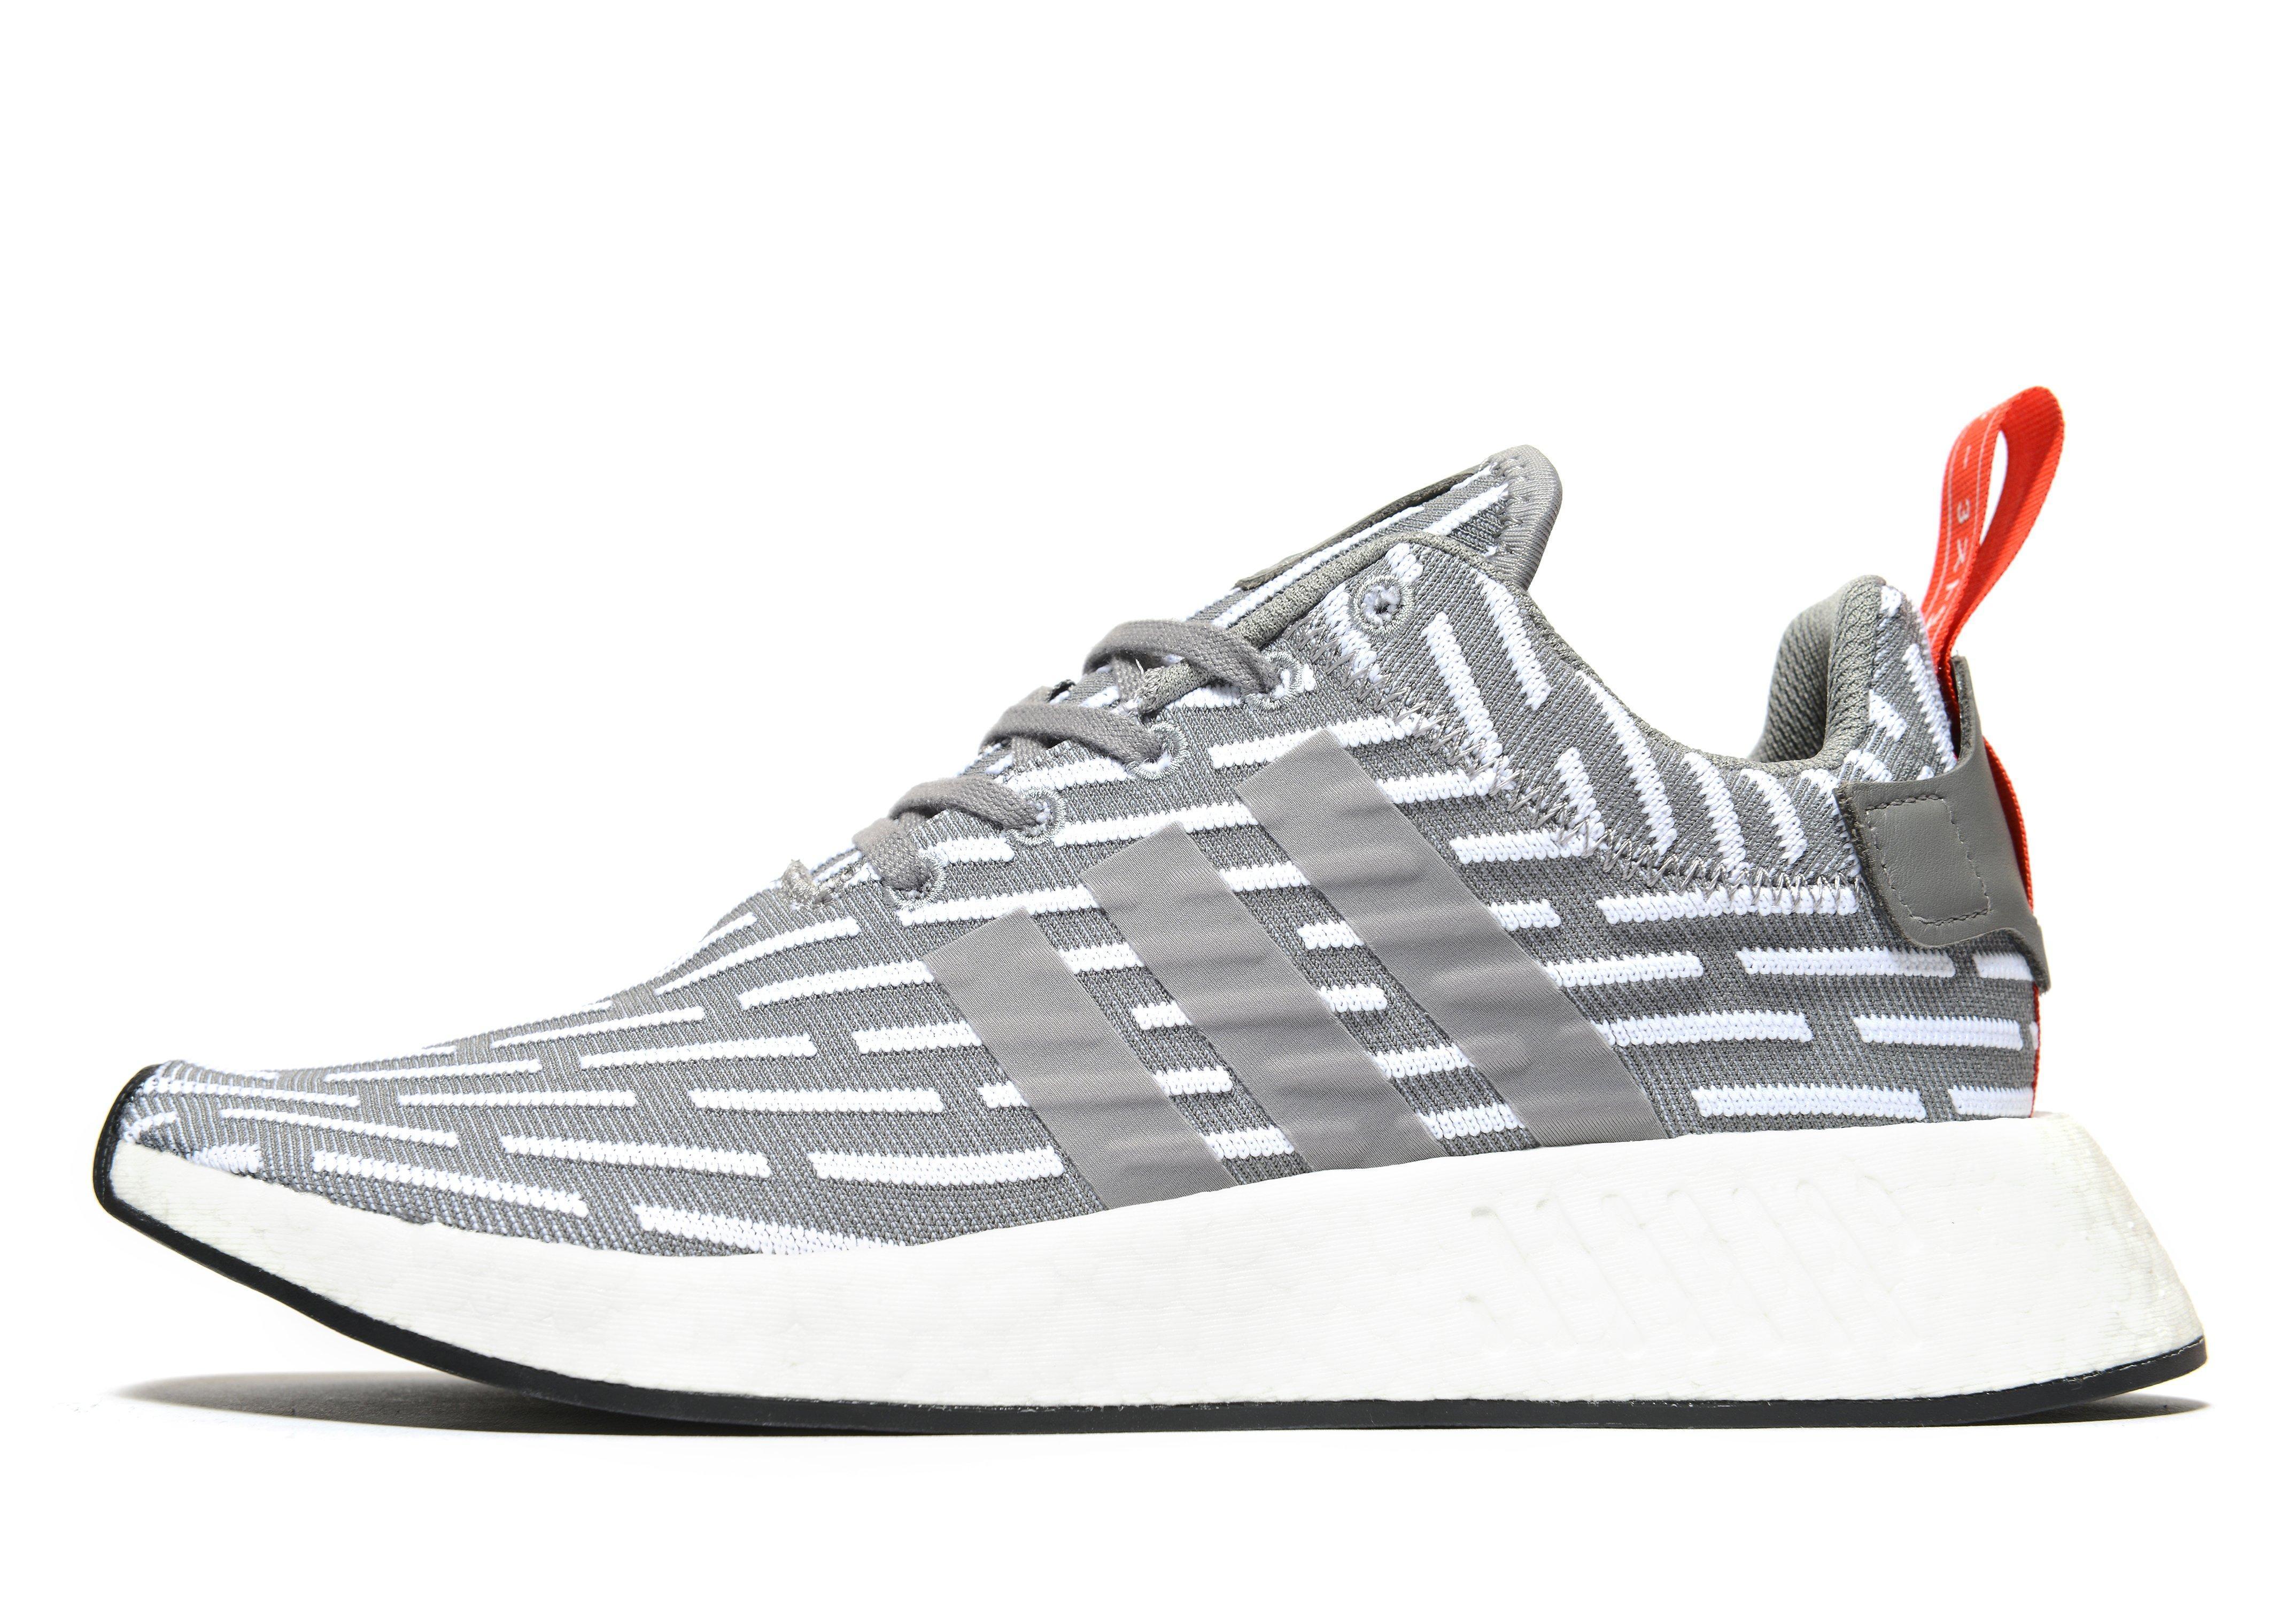 Adidas Originals Nmd R2 In Gray For Men